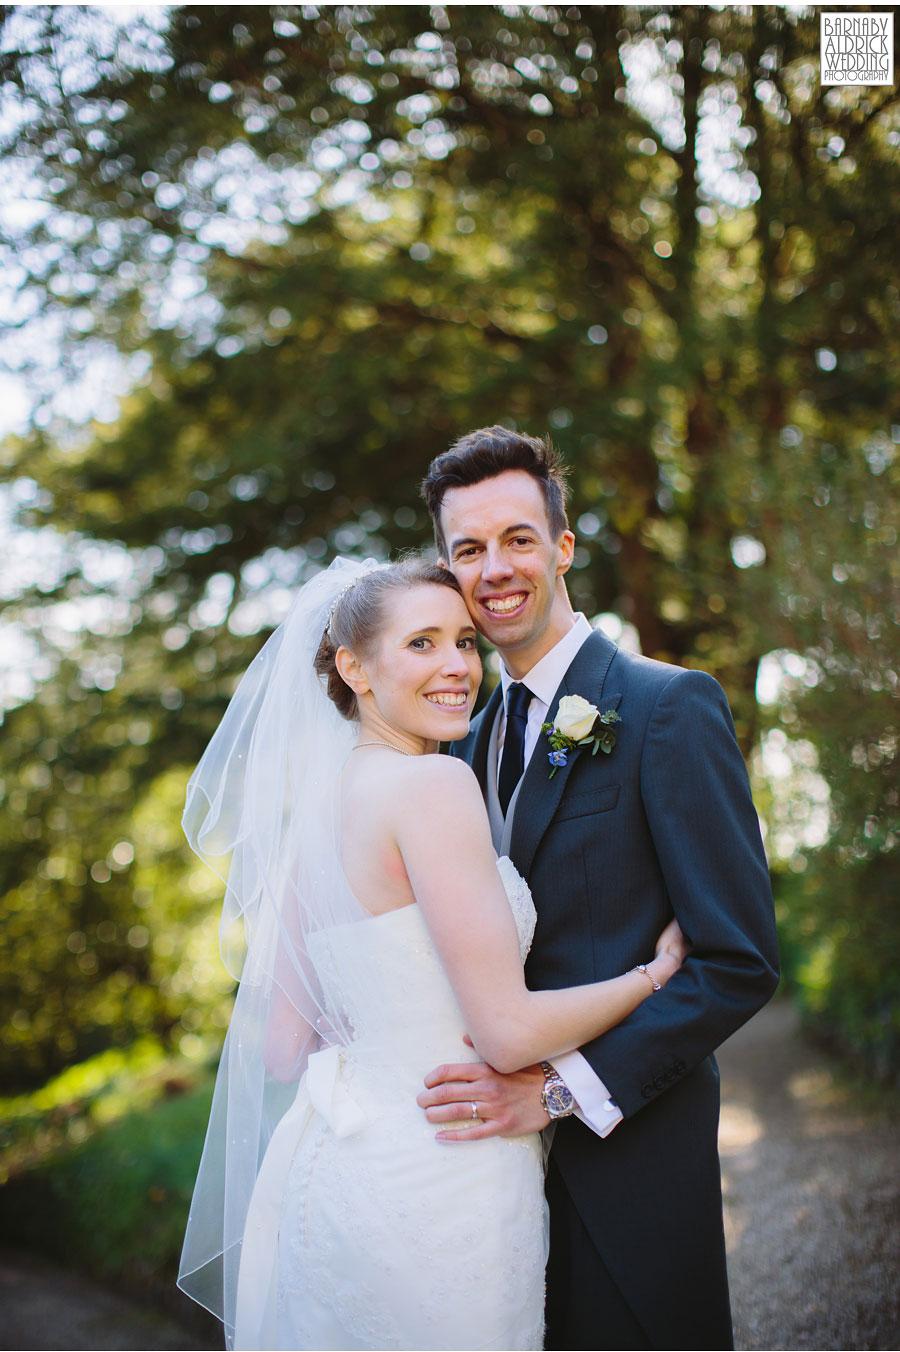 Wedding Photography at Buckland Tout Saints South Devon, Devon Wedding Photographer Barnaby Aldrick, Dartmouth Wedding; Kingswear Devon Wedding, 073